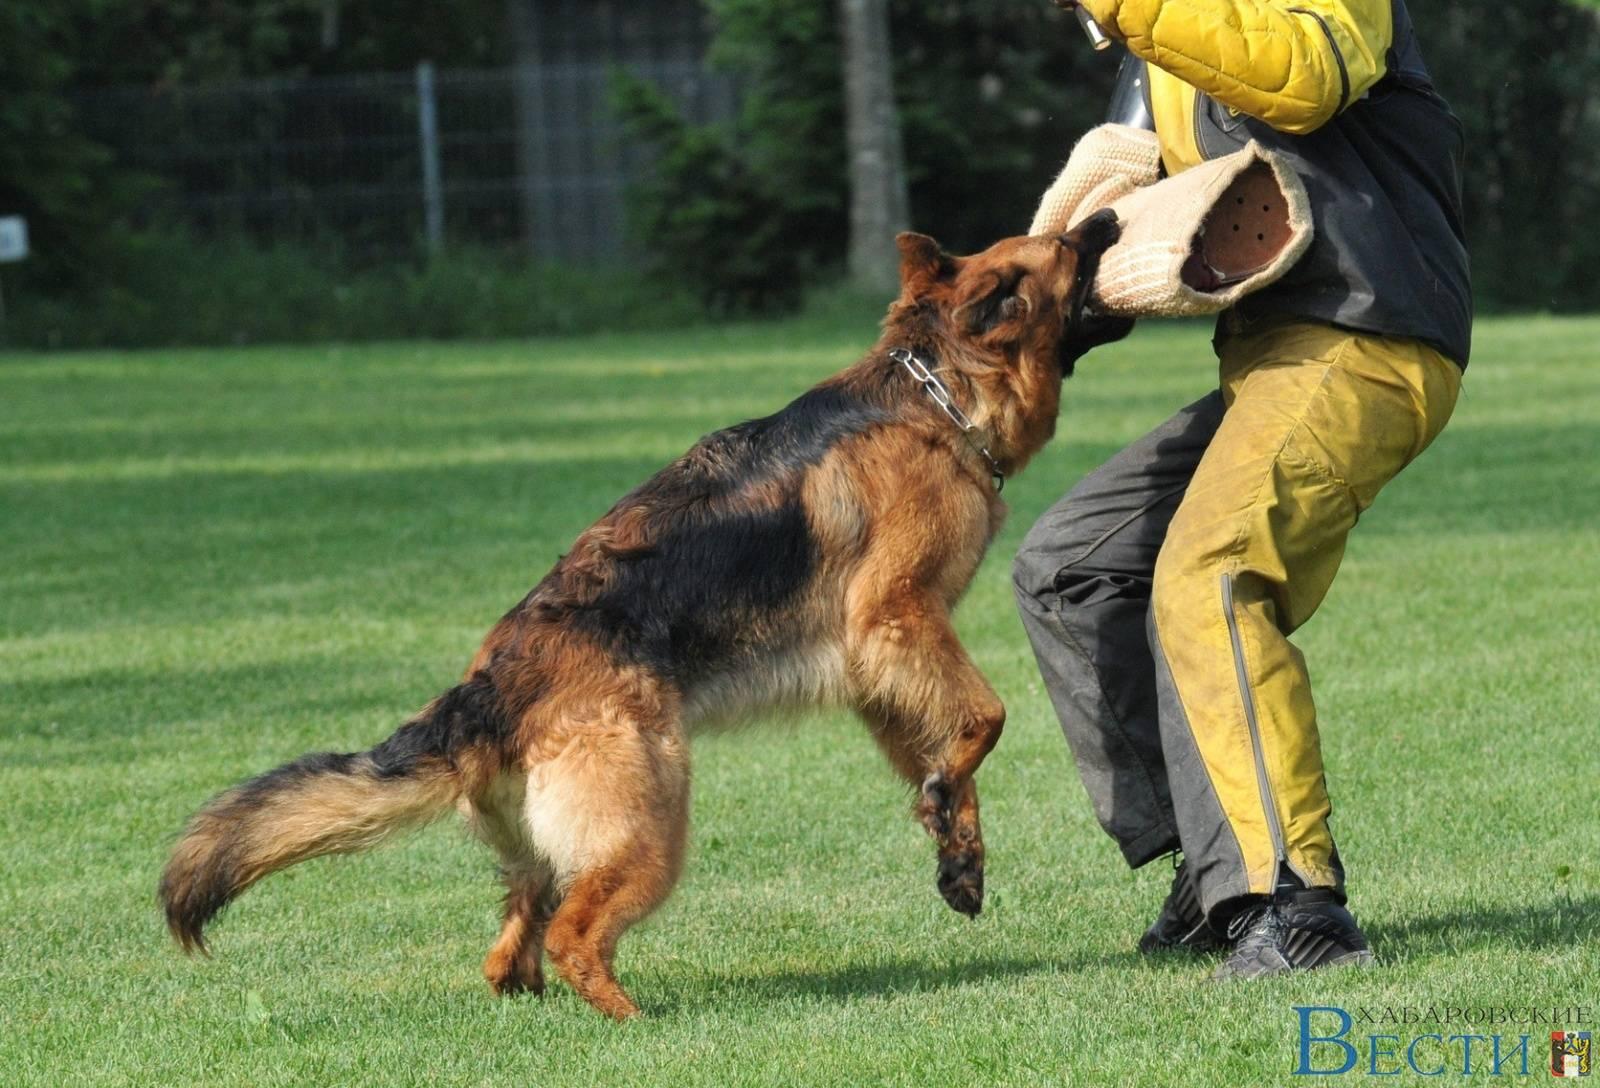 Как научить собаку командам в домашних условиях, каким 48